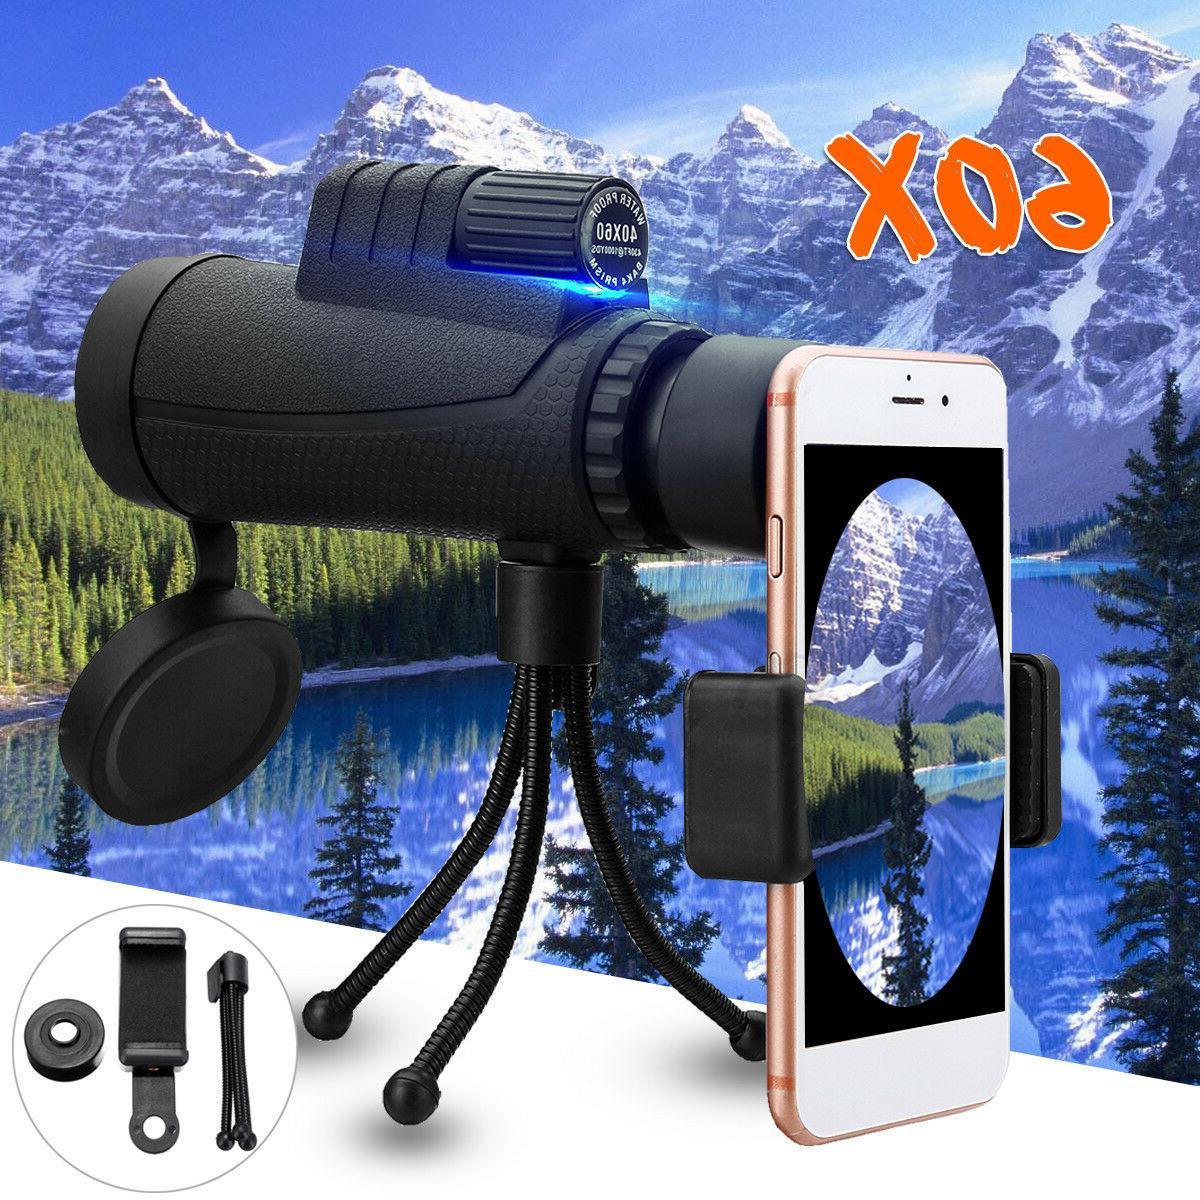 40X60 Monocular Telescope HD Tripod + Mobile Phone